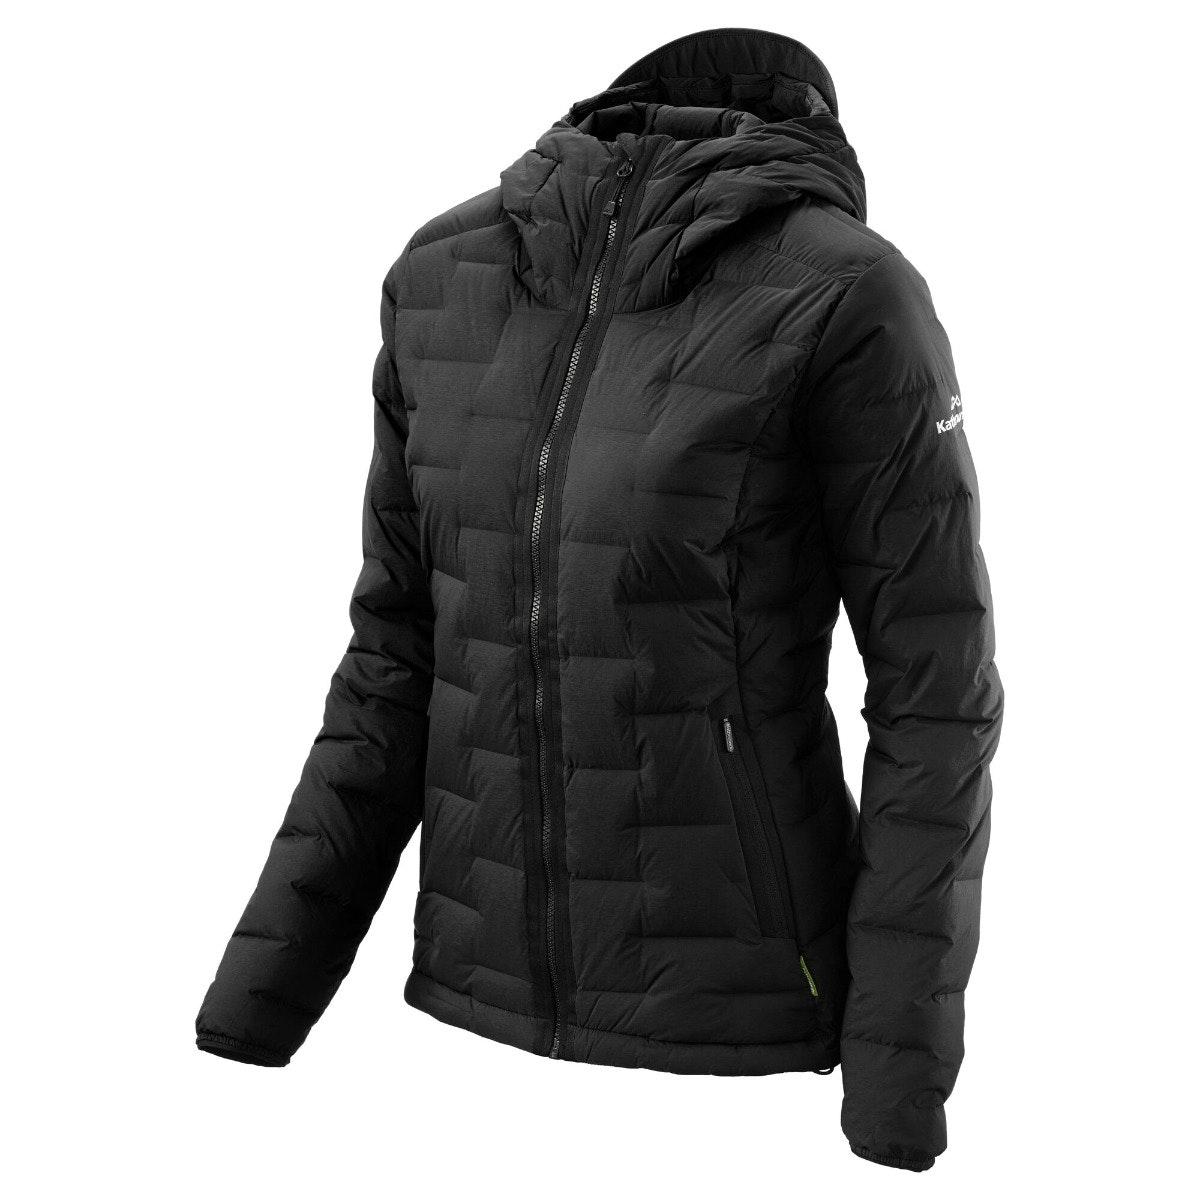 NEW-Kathmandu-Federate-Women-039-s-Stretch-Down-Hooded-Jacket thumbnail 6